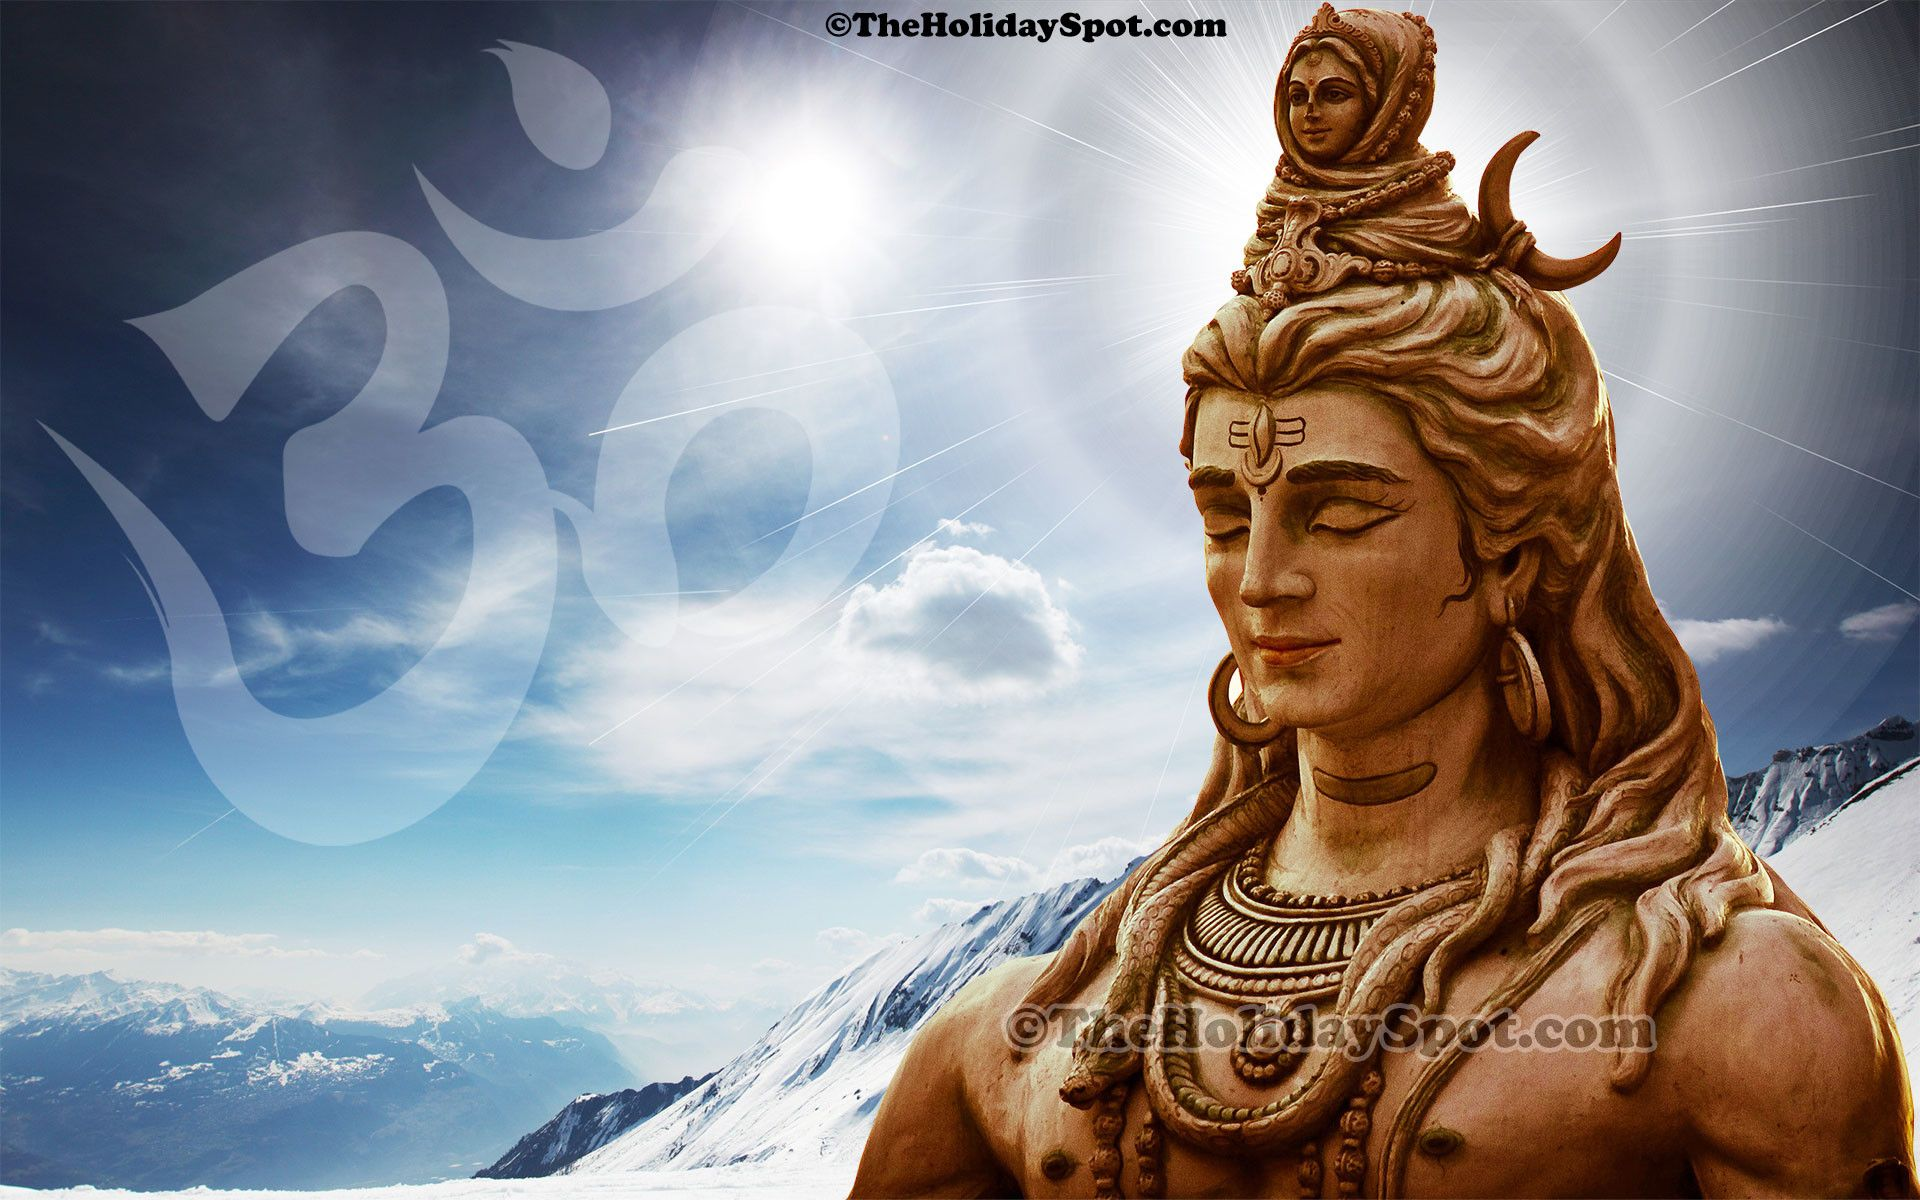 1920x1200 Lord Shiva Hd Wallpaper Shiva Wallpaper Shivratri Wallpaper